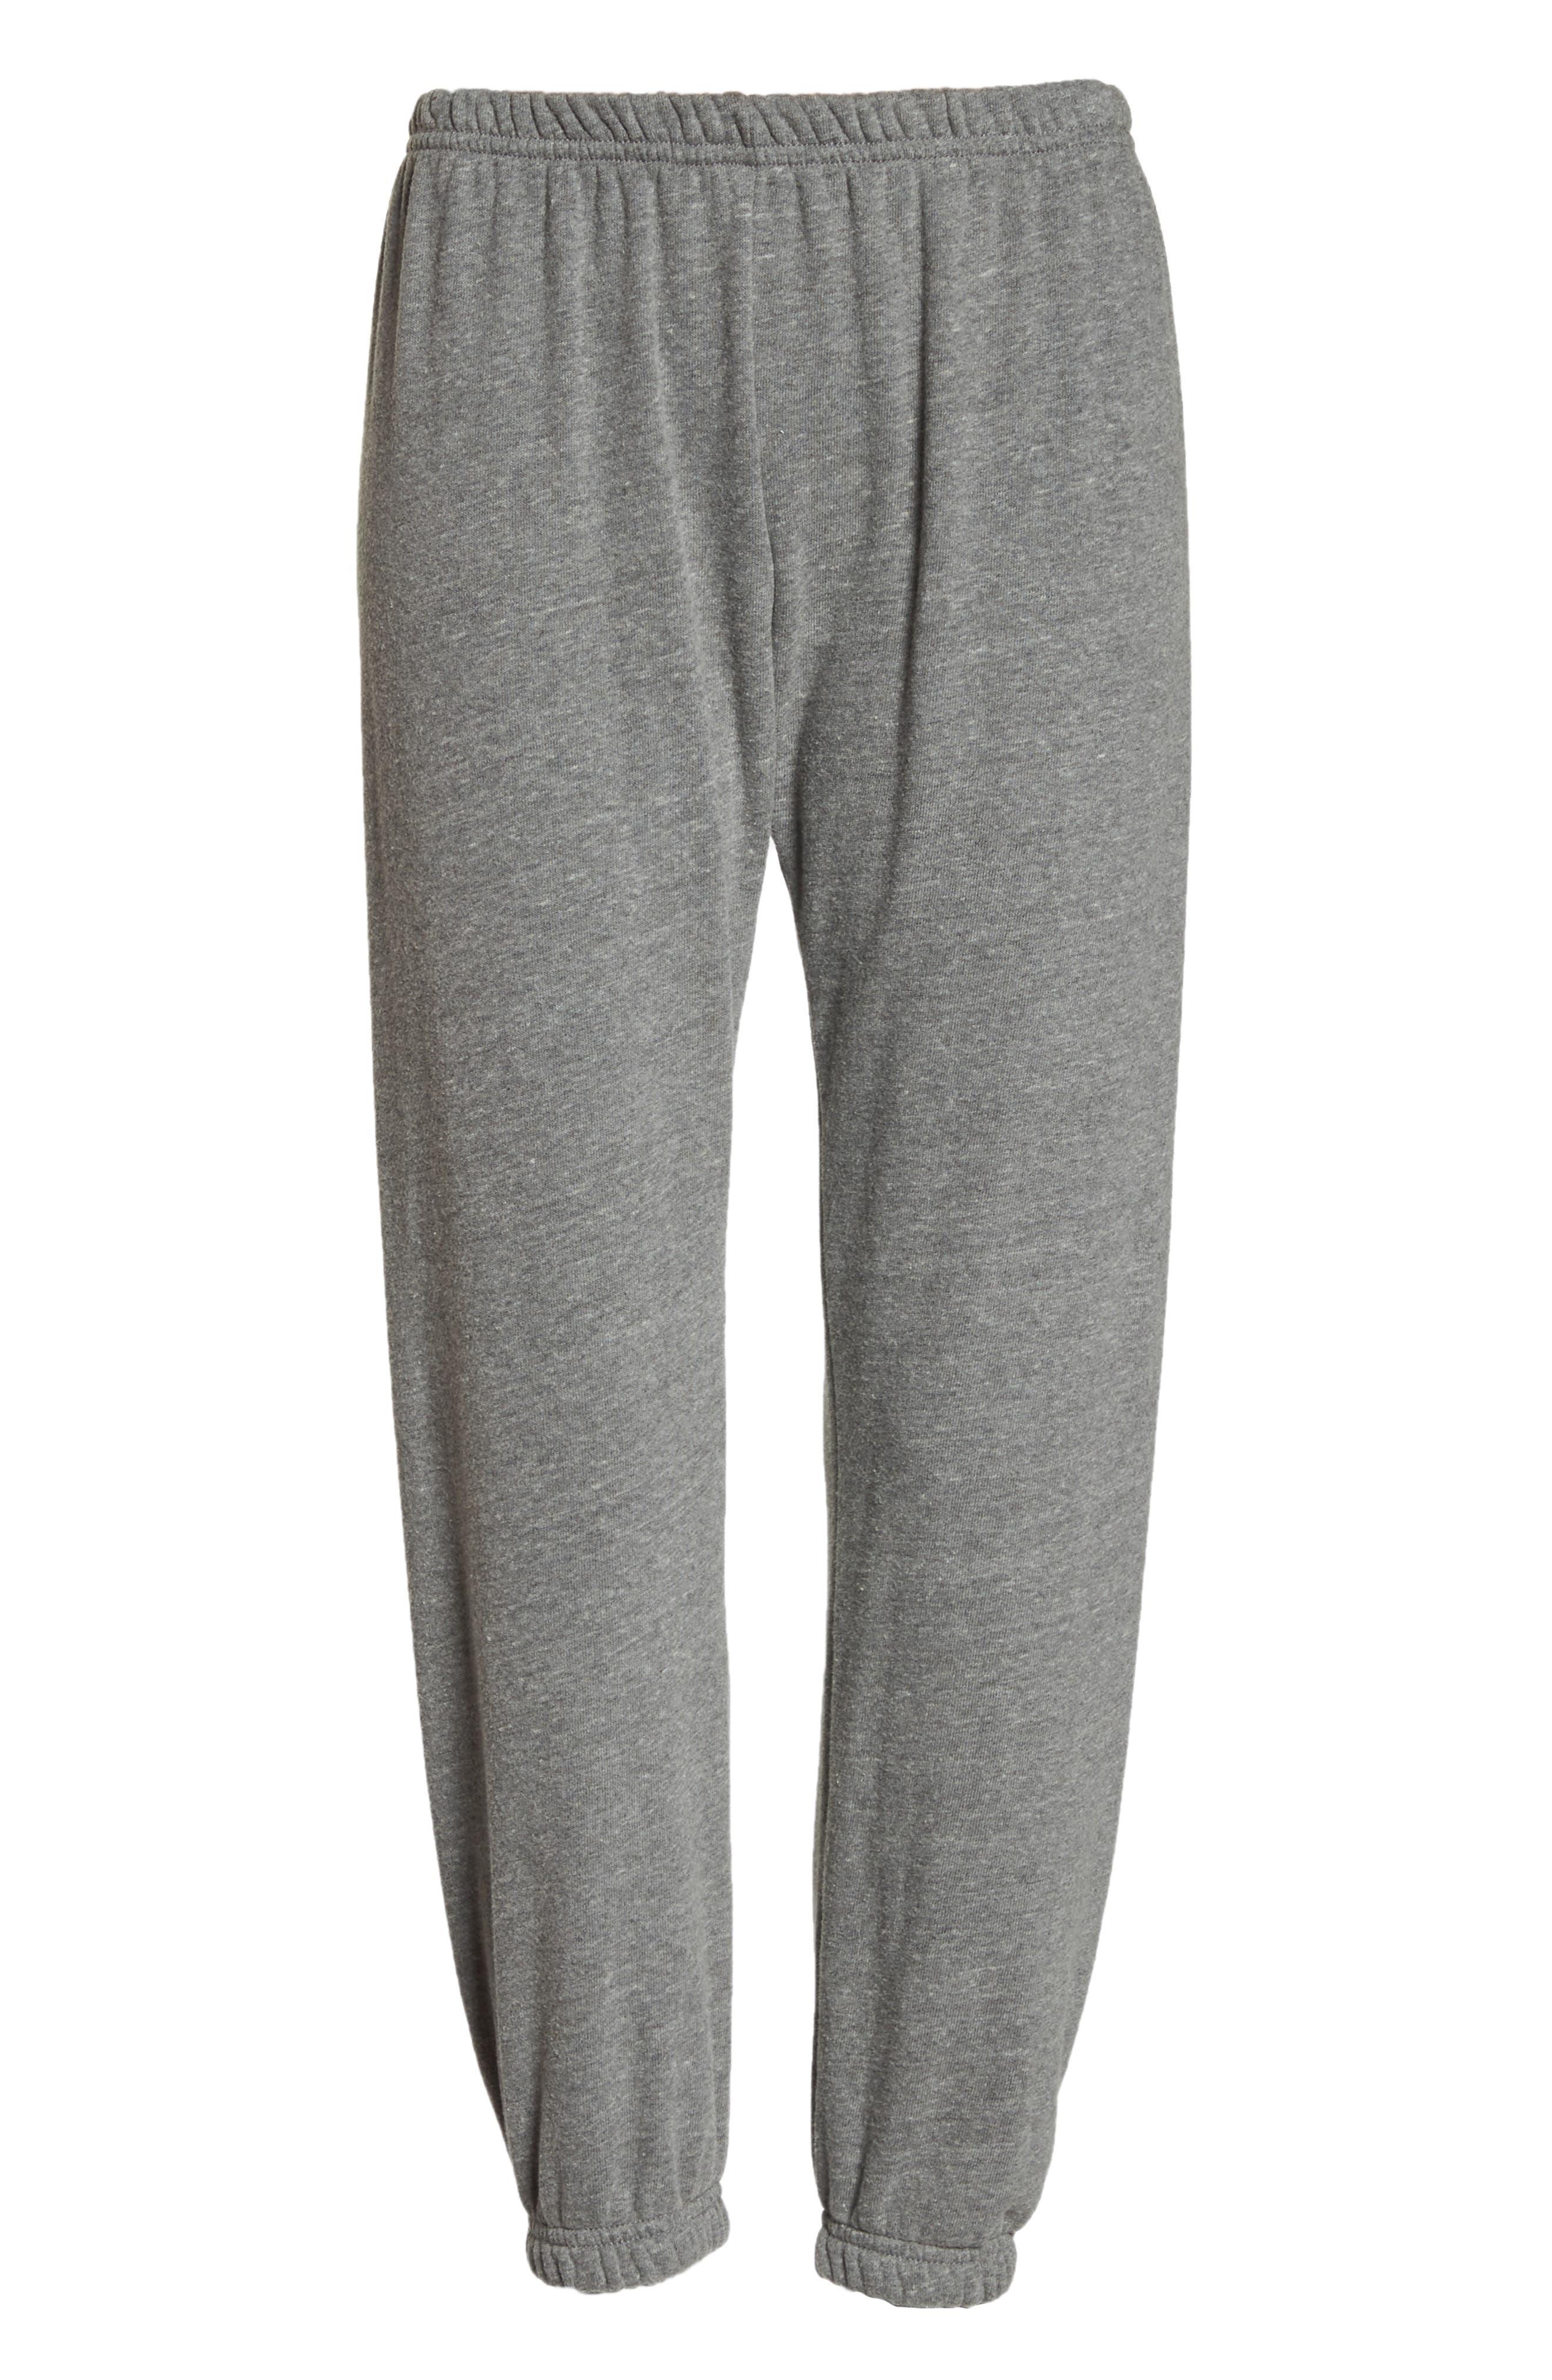 Varsity Perfect Sweatpants,                             Alternate thumbnail 7, color,                             HEATHER GREY